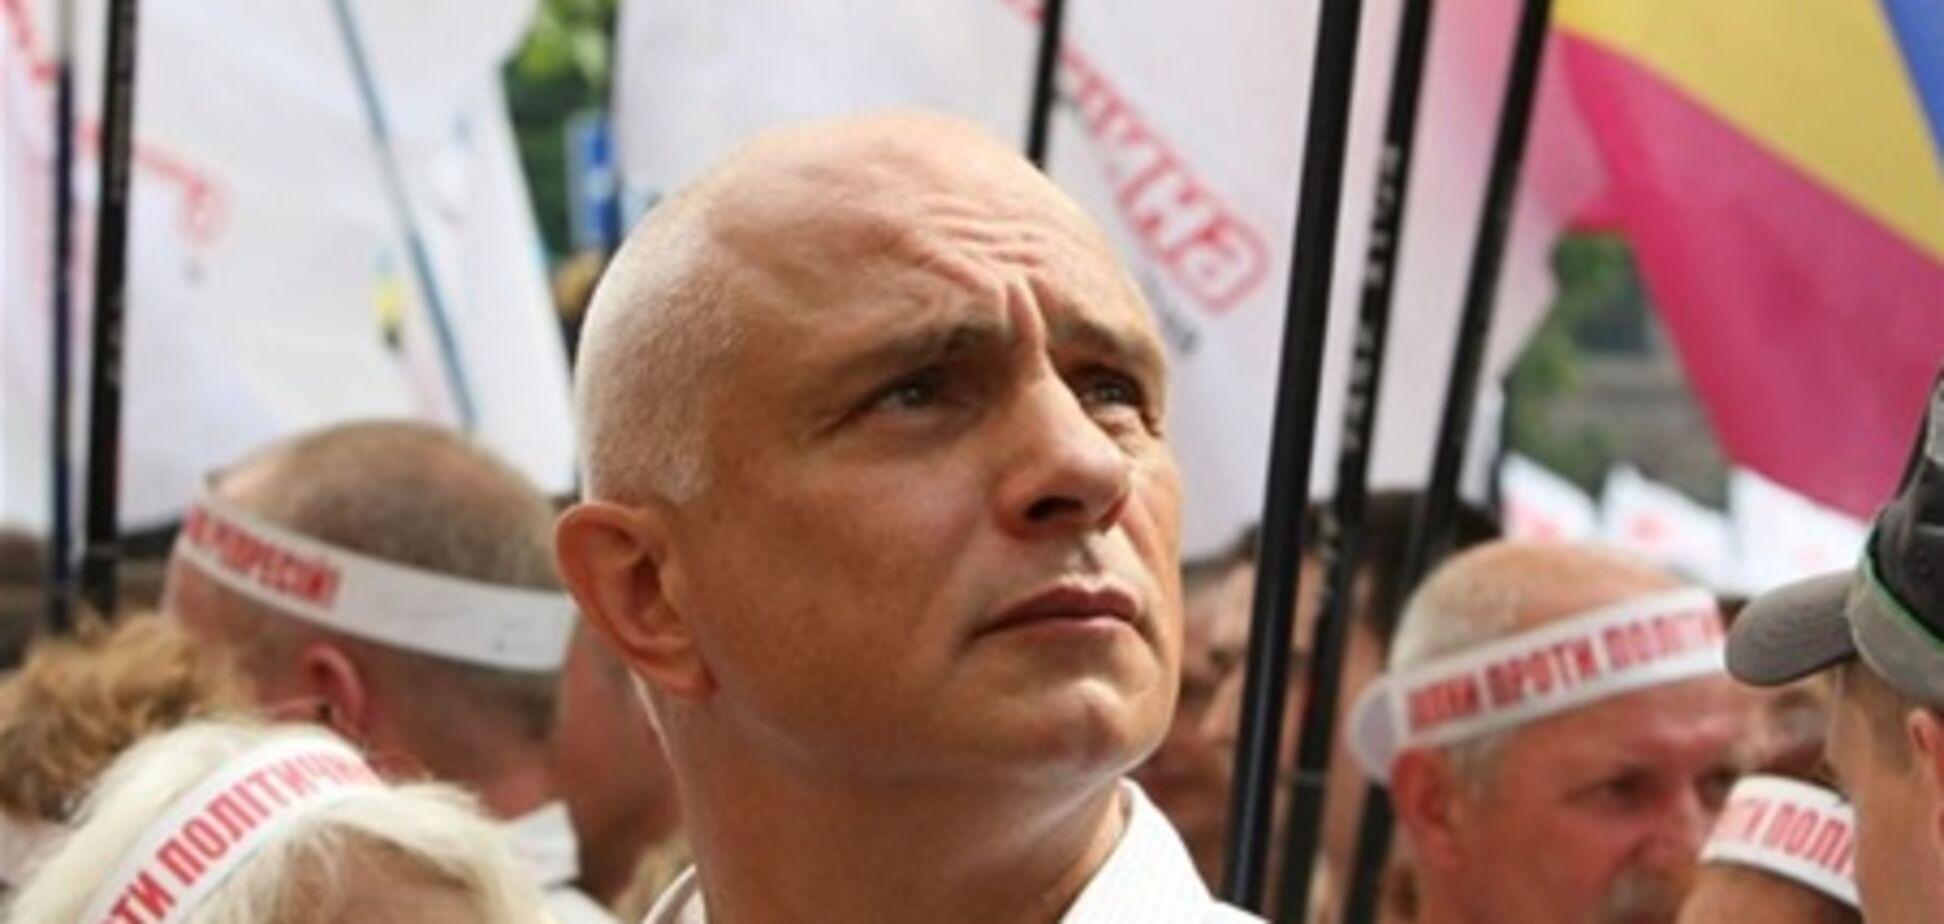 Александр Тимошенко «свернул» бизнес в Чехии